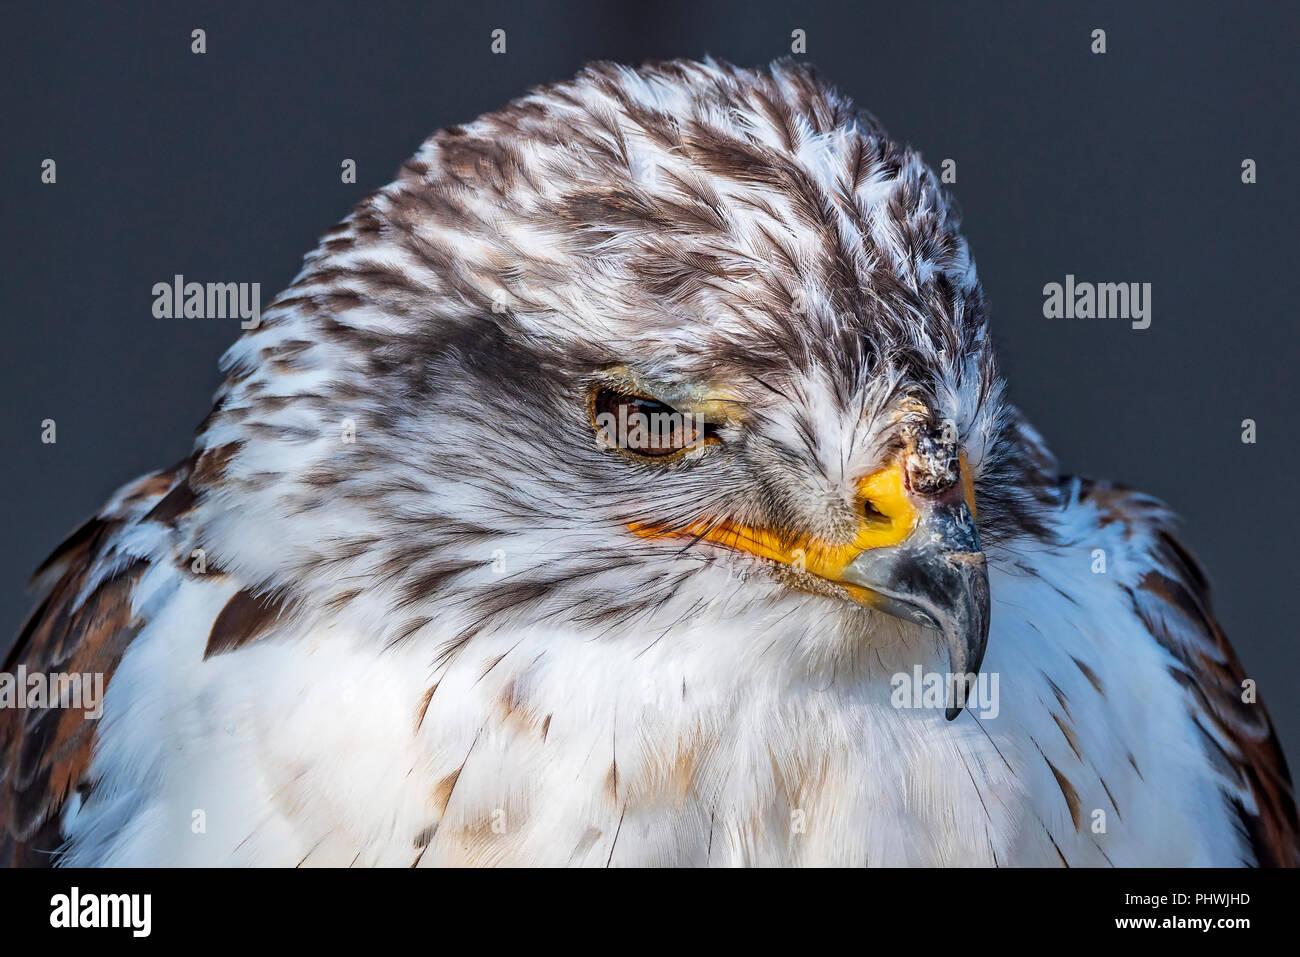 Raptor. Bird of Prey. Ferruginous hawk. Buteo reglis. Male. - Stock Image